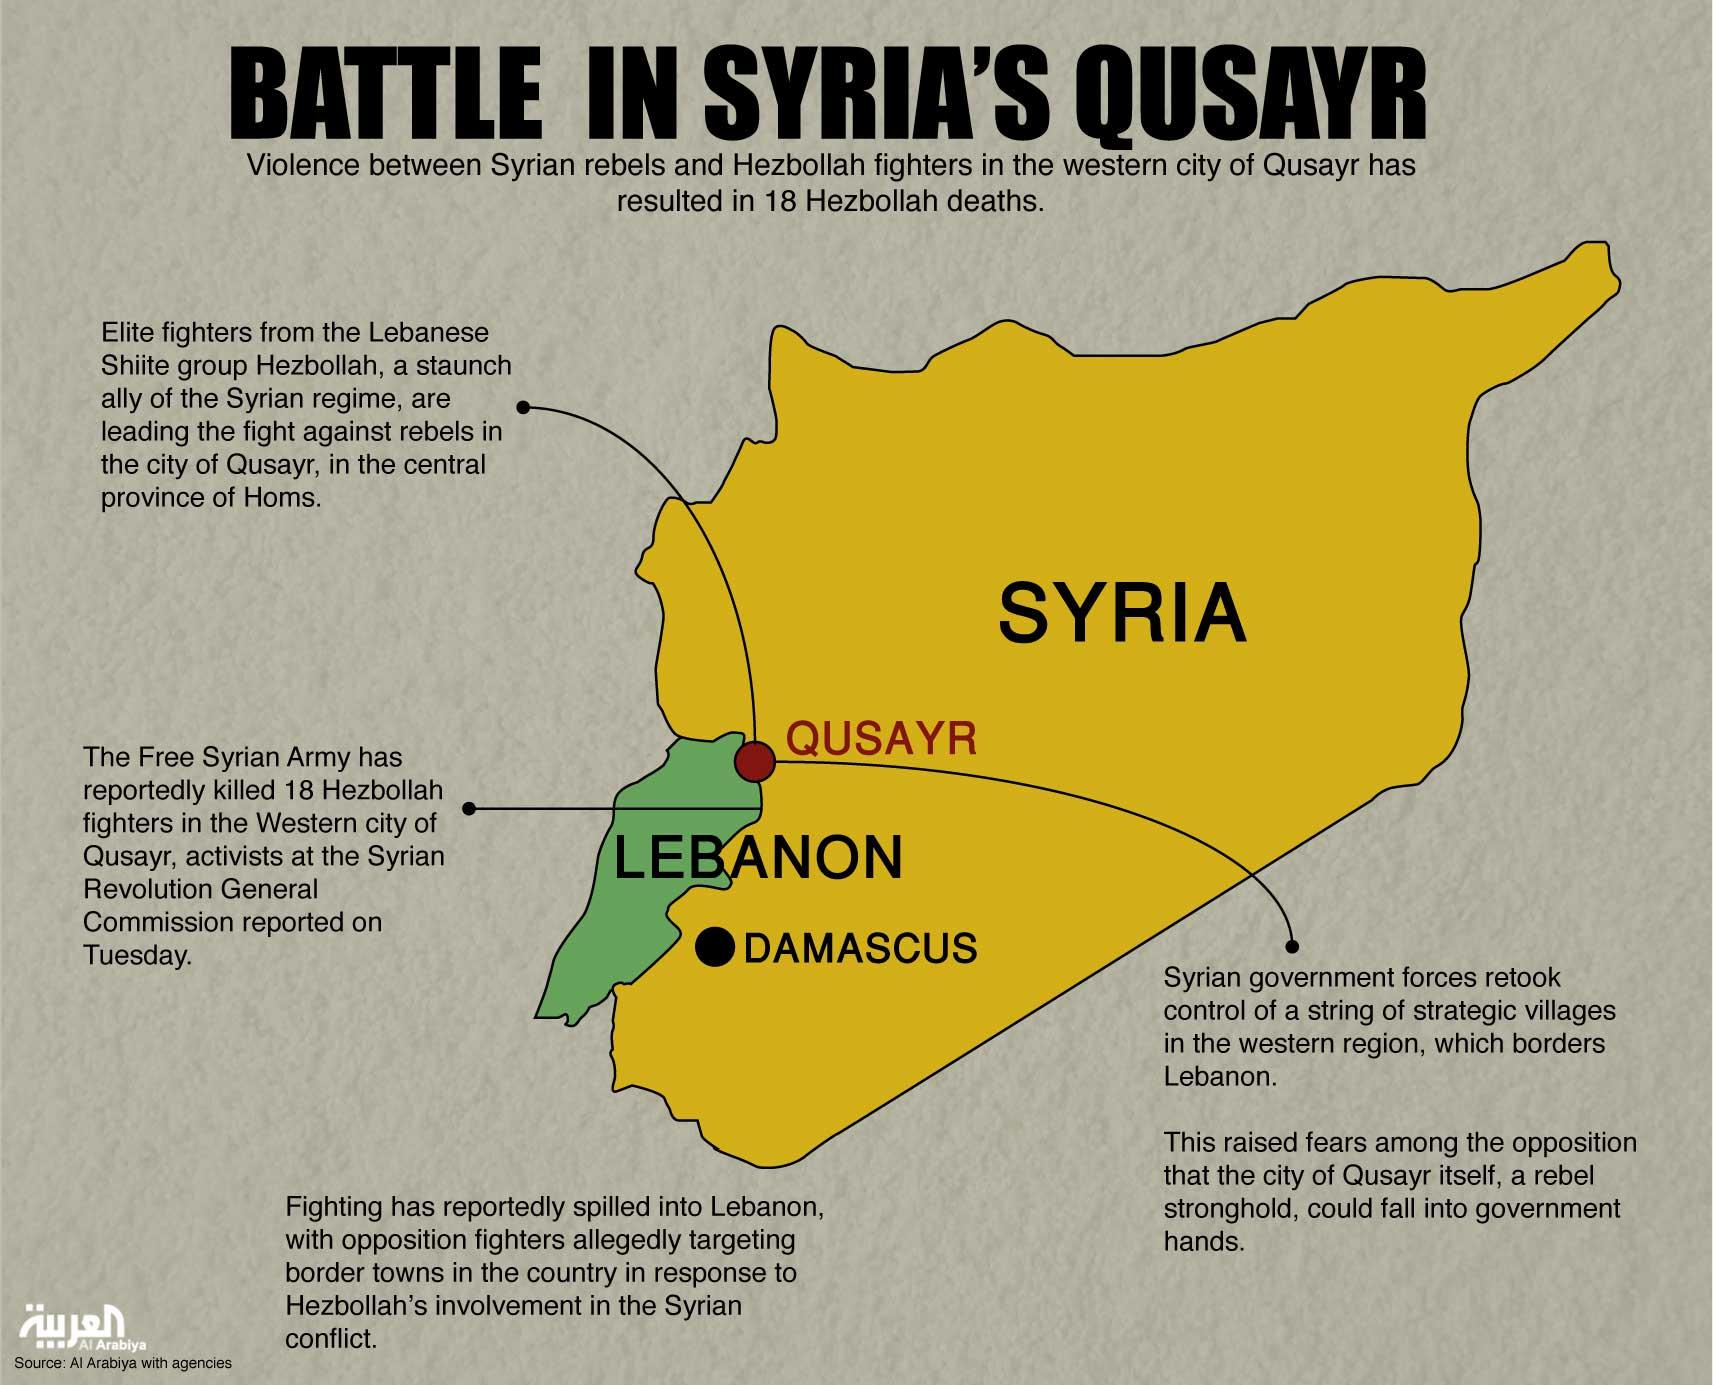 Info graphic: Battle in Syria's Qusayr (Design by Farwa Rizwan / Al Arabiya English)